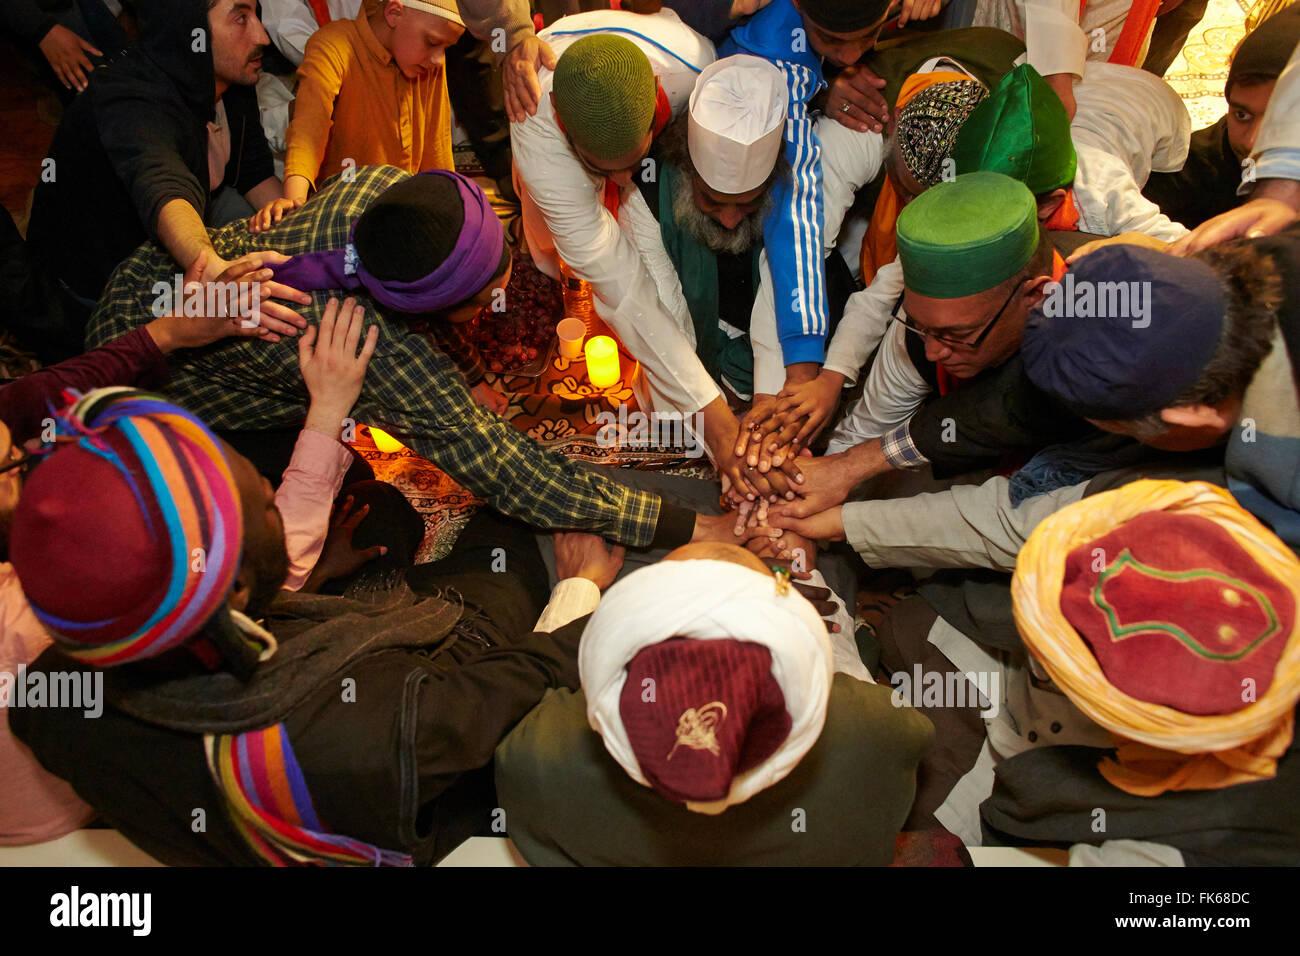 Naqshbandi Sufis joining hands, Paris, France, Europe - Stock Image